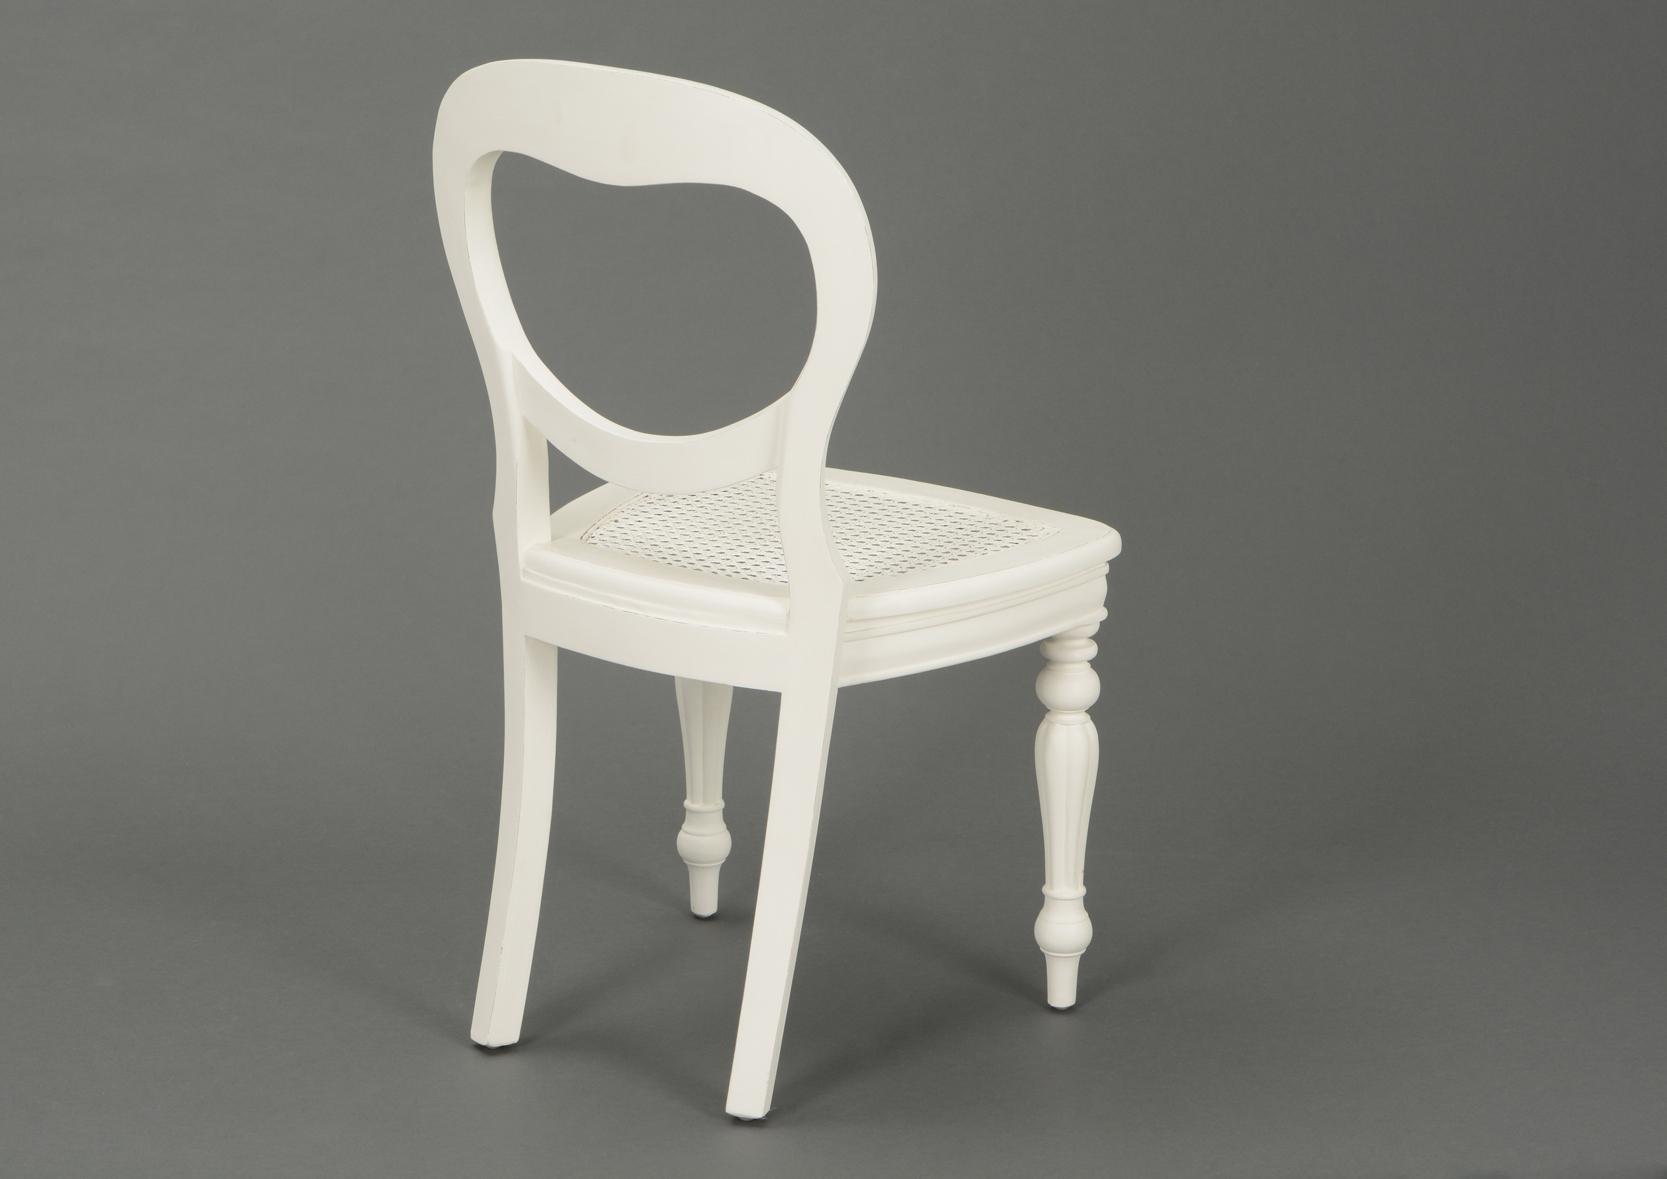 Chaise rotin agathe amadeus 118414 o magasin de for Chaise blanche rotin